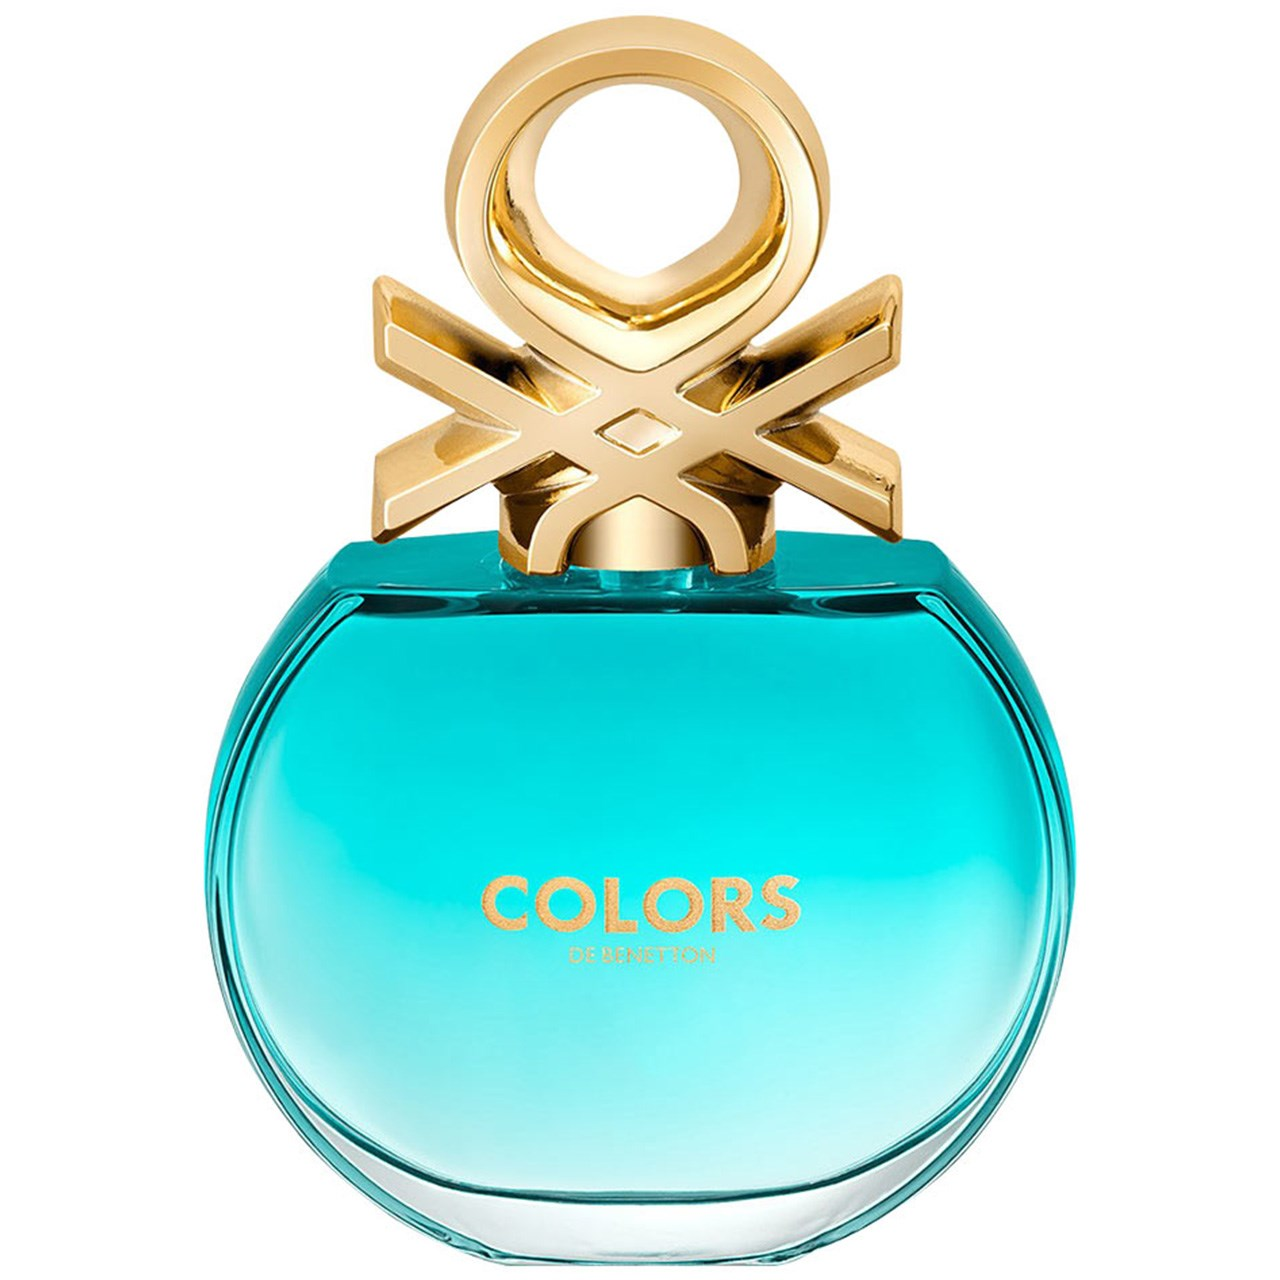 ادو تویلت زنانه بنتون مدل Colors de Benetton Blue حجم 80 میلی لیتر